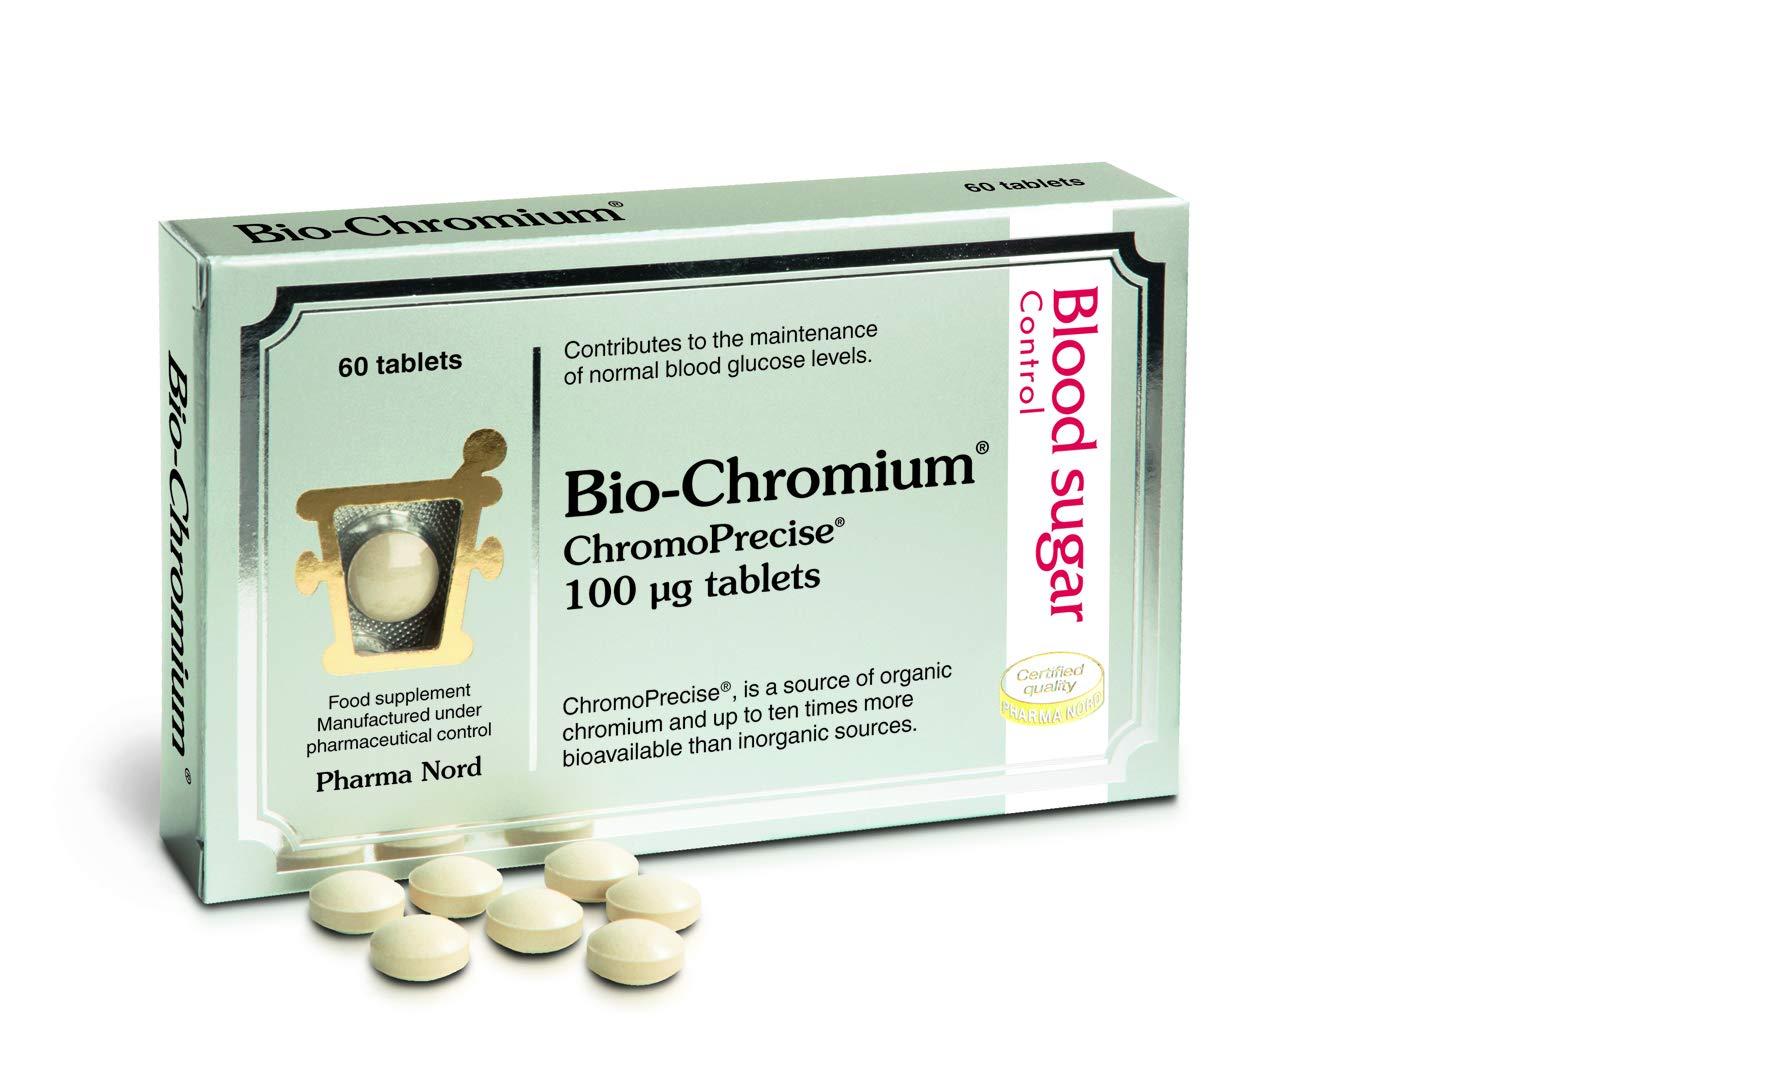 Pharma Nord 100 mcg Bio-chromium - Pack of 60 Tablets